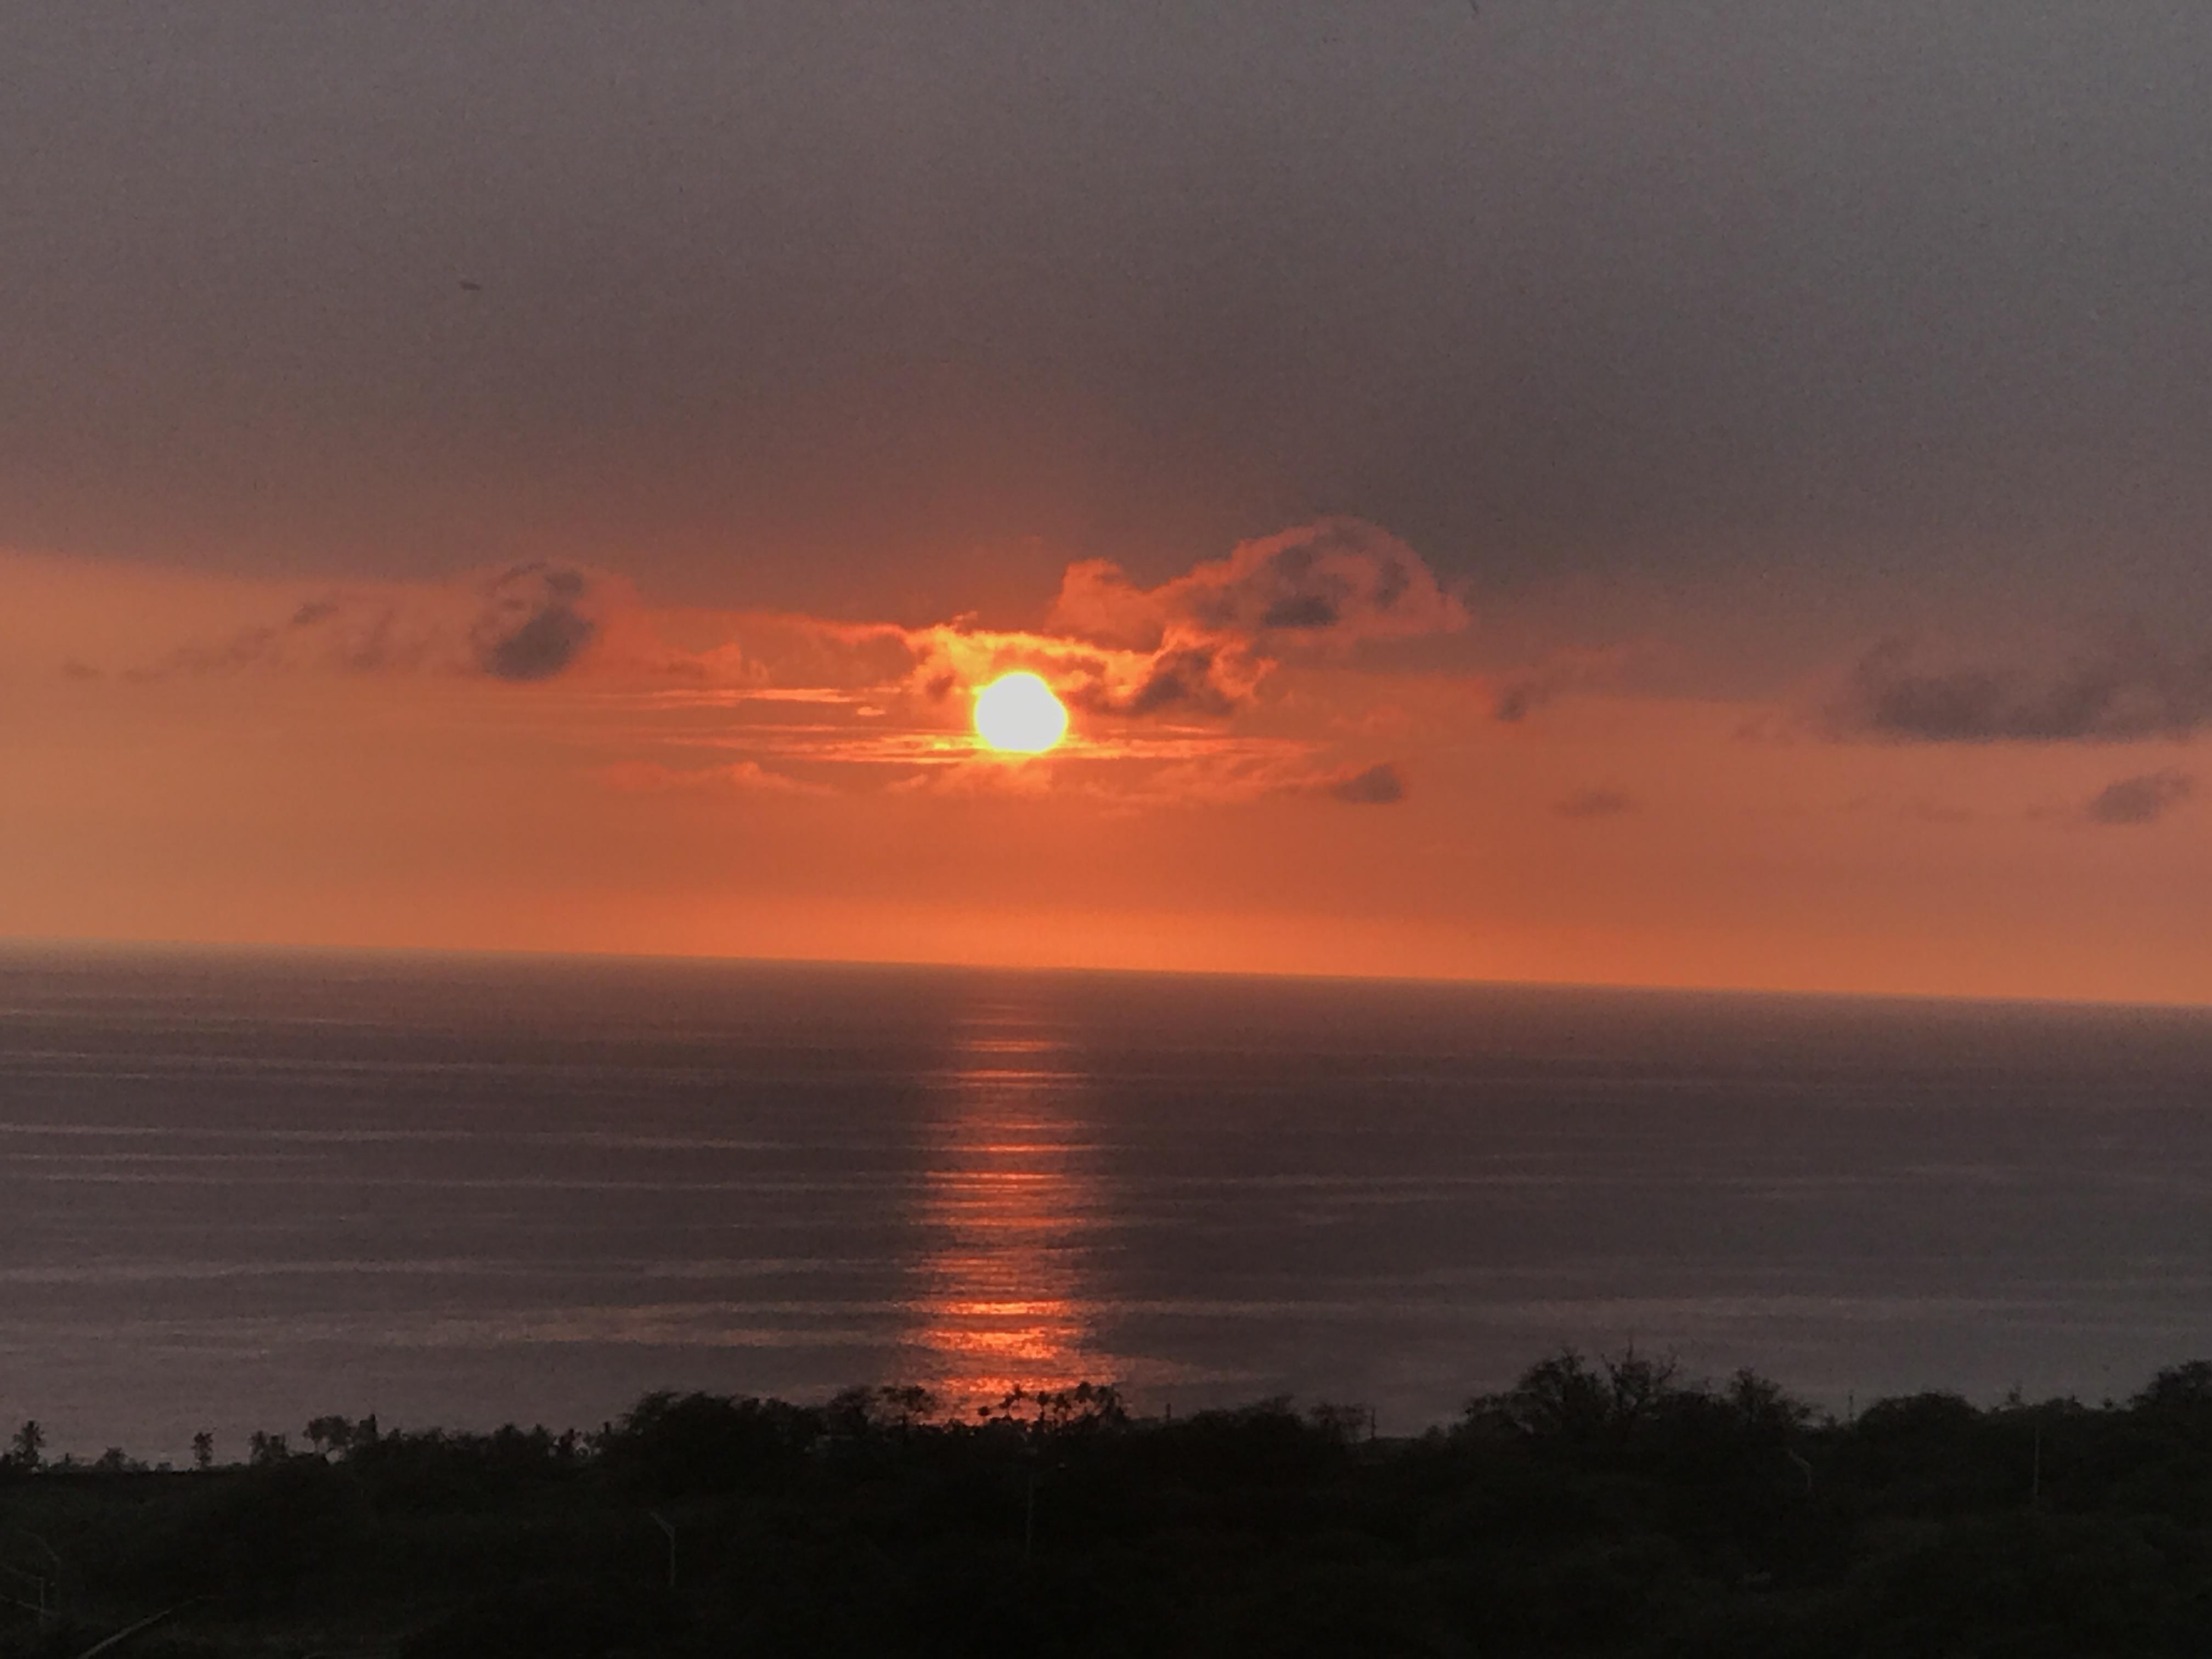 Sunset colors in Kona skies, Kailua Kona, HI.